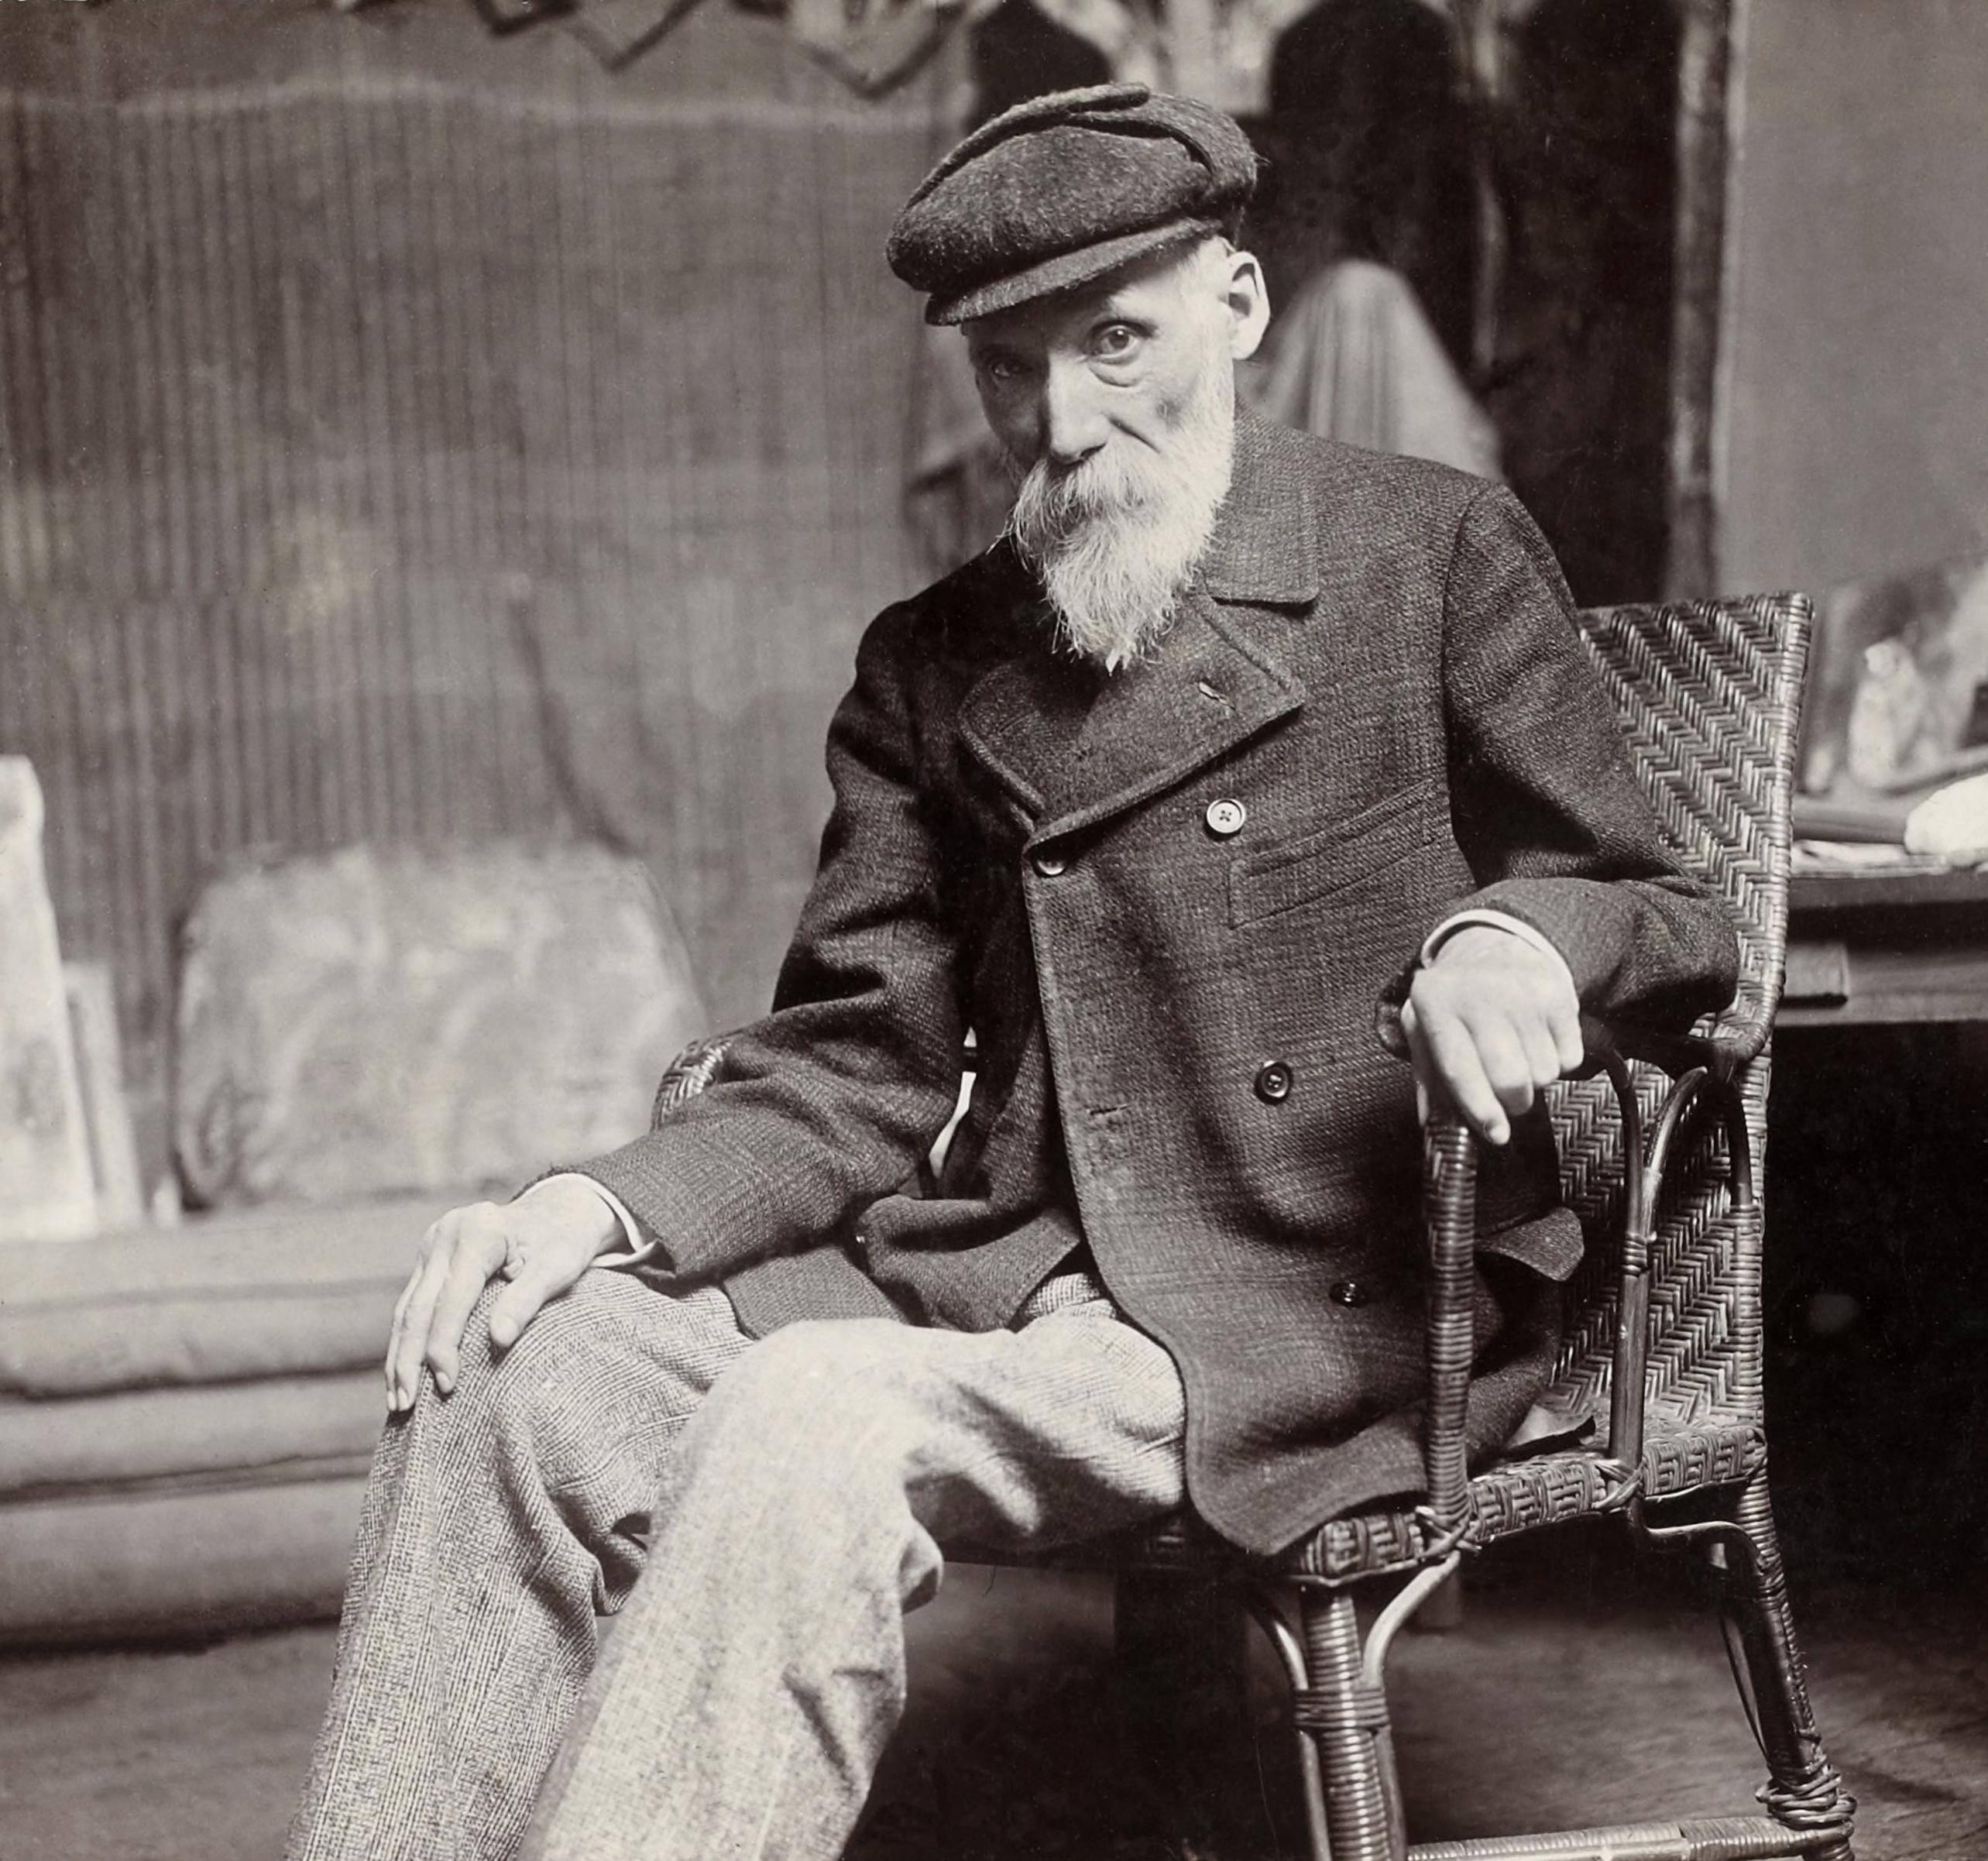 https://upload.wikimedia.org/wikipedia/commons/b/b5/Renoir%2C_Pierre-Auguste%2C_by_Dornac%2C_BNF_Gallica.jpg